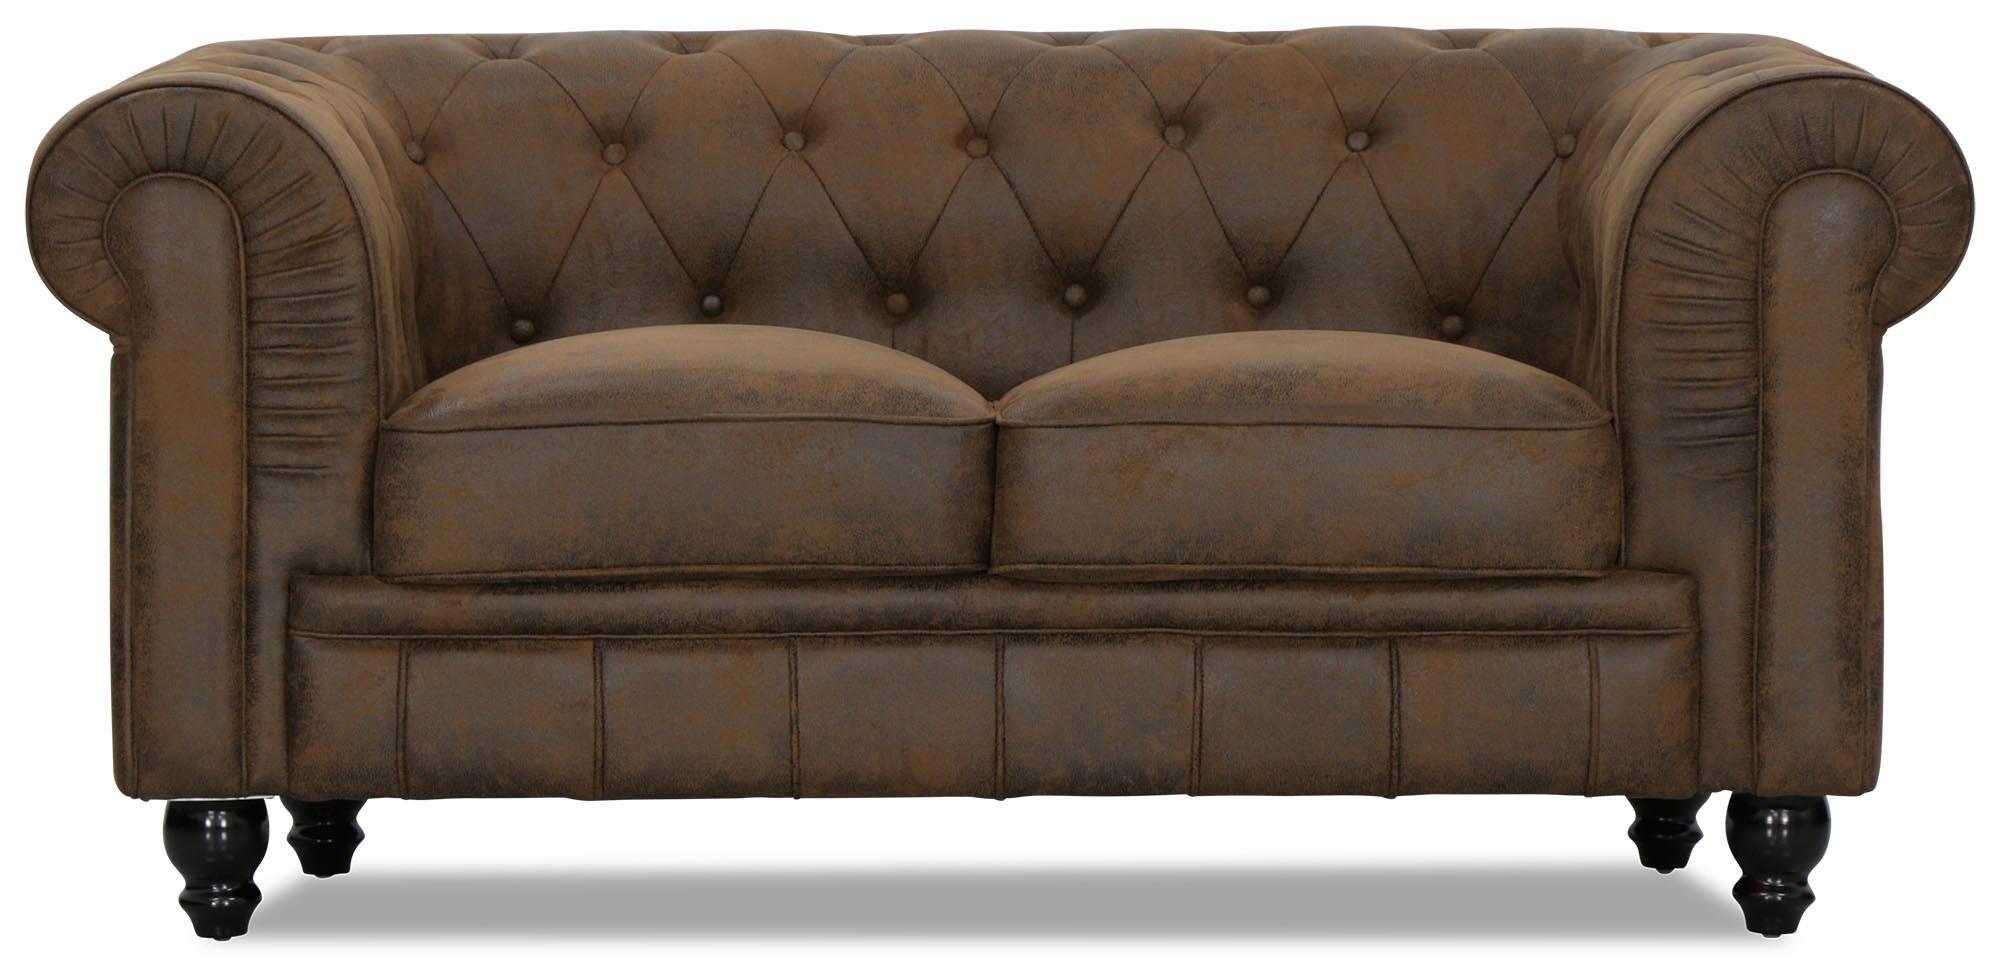 Benjamin Classical 2 Seater Vintage PU Leather Sofa | Furniture ...